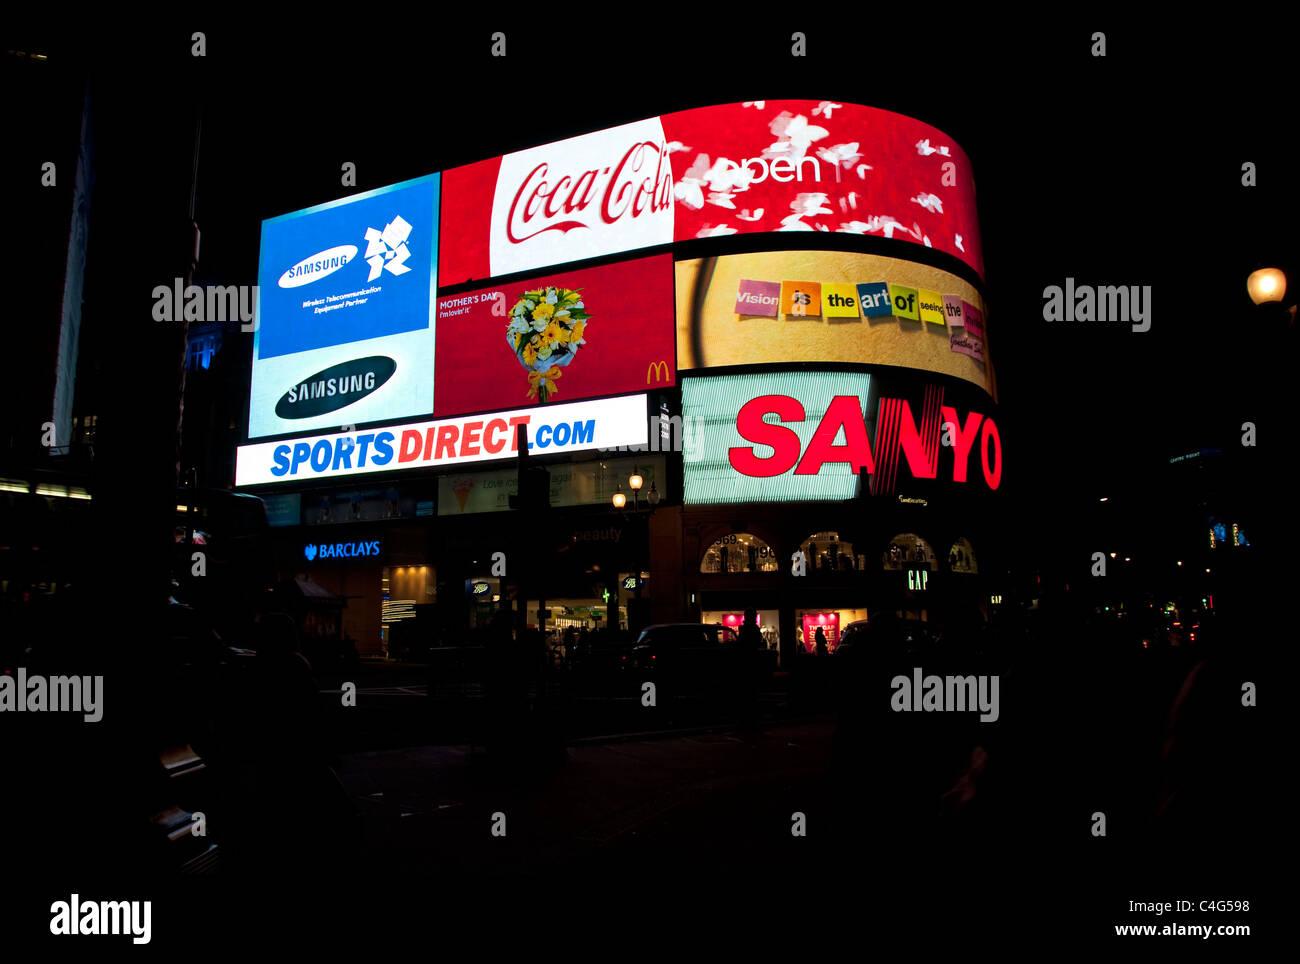 Piccadilly Circus at night, London, UK - Stock Image